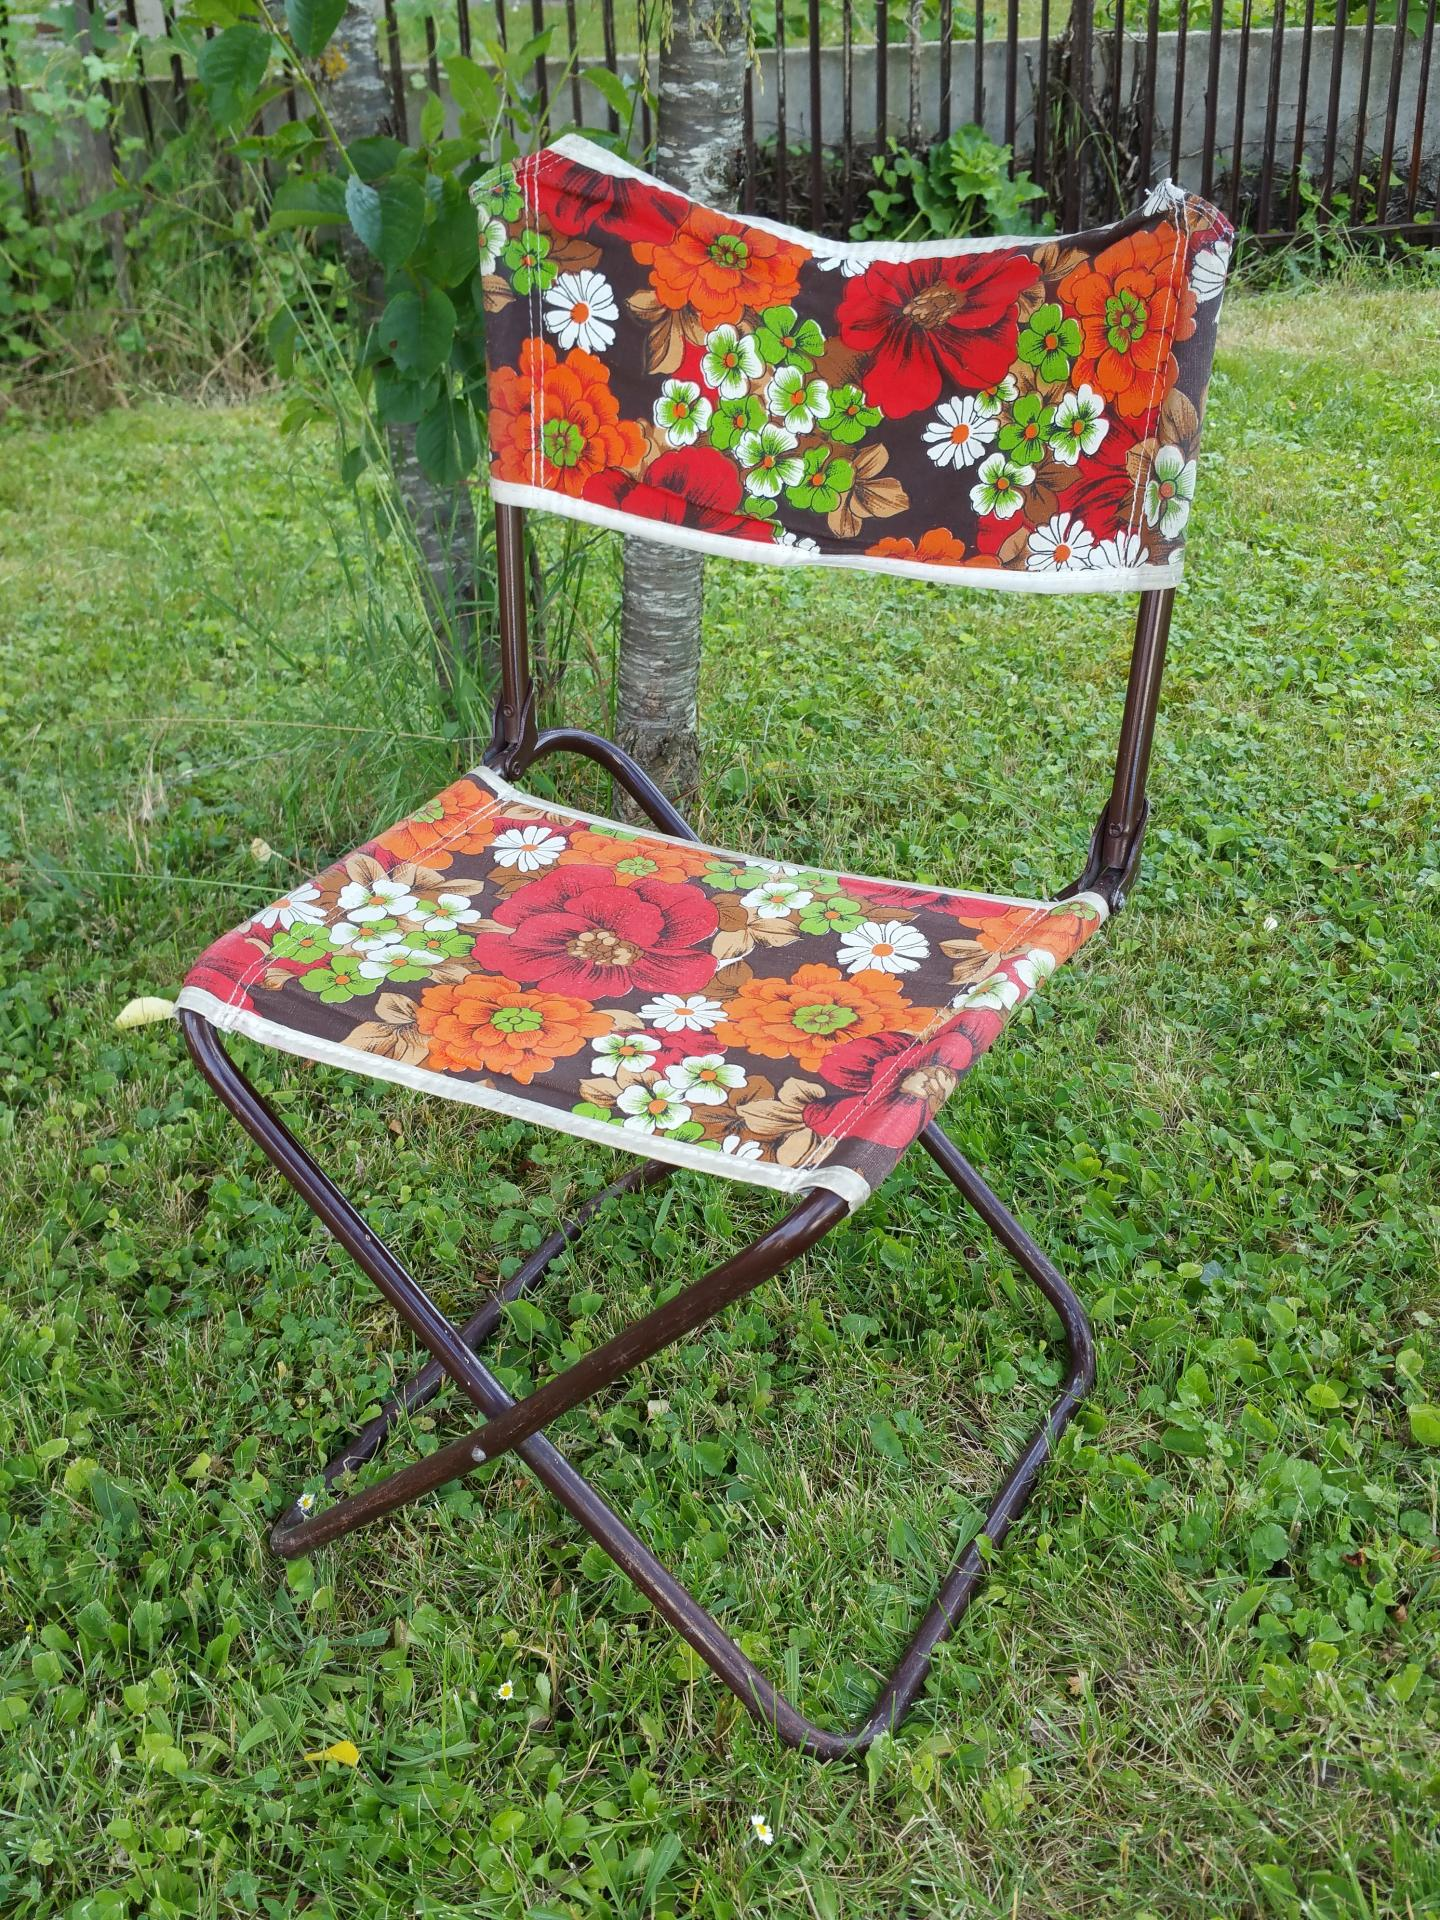 2 chaise pliante de camping